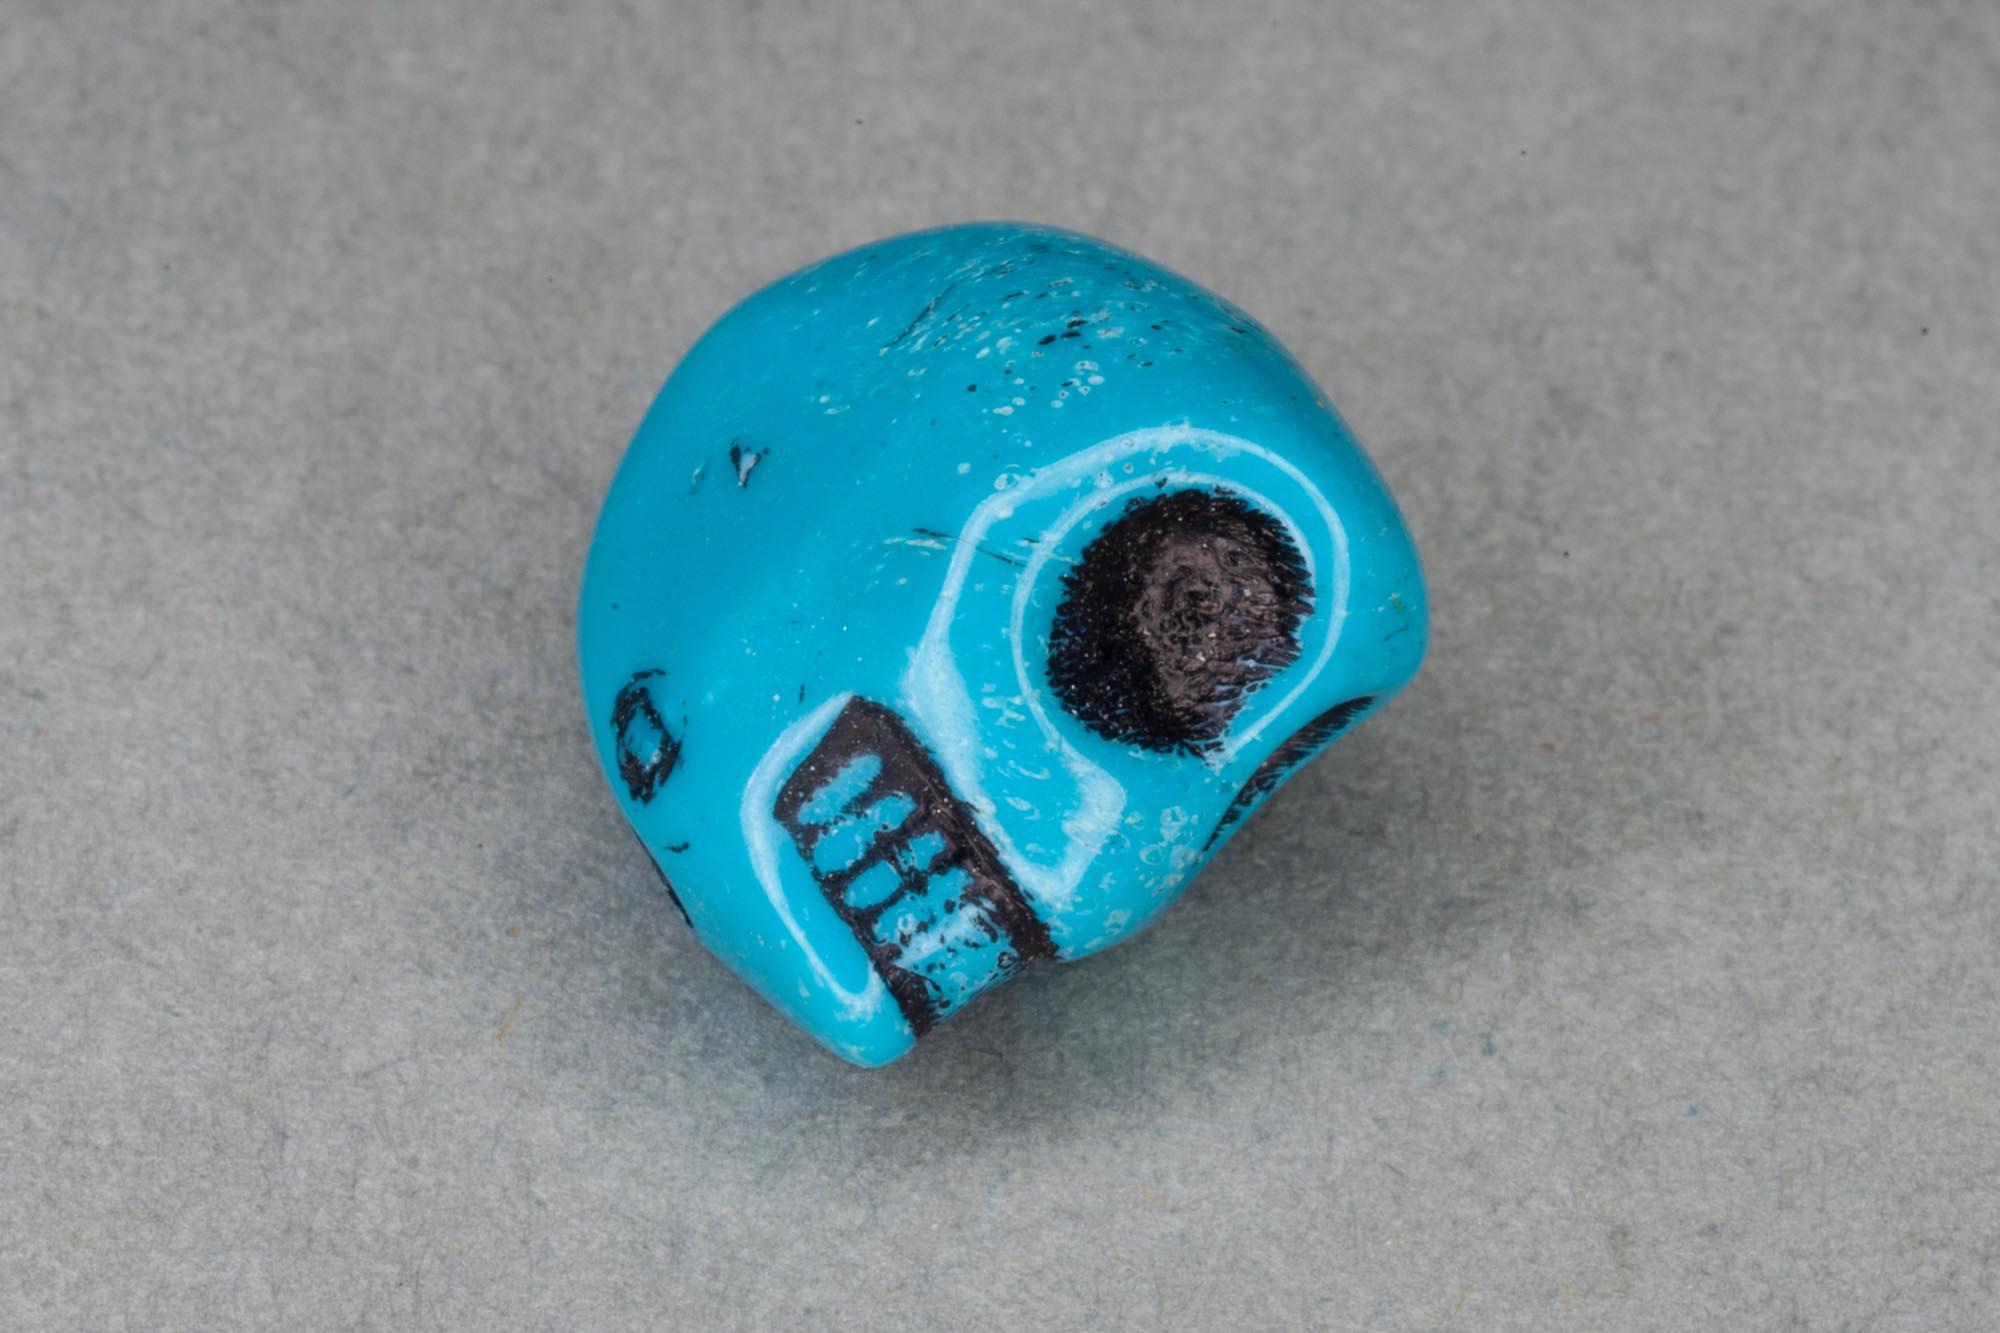 Turquoise Acrylic Skull Bead, 12x12x10mm, 1.2mm hole